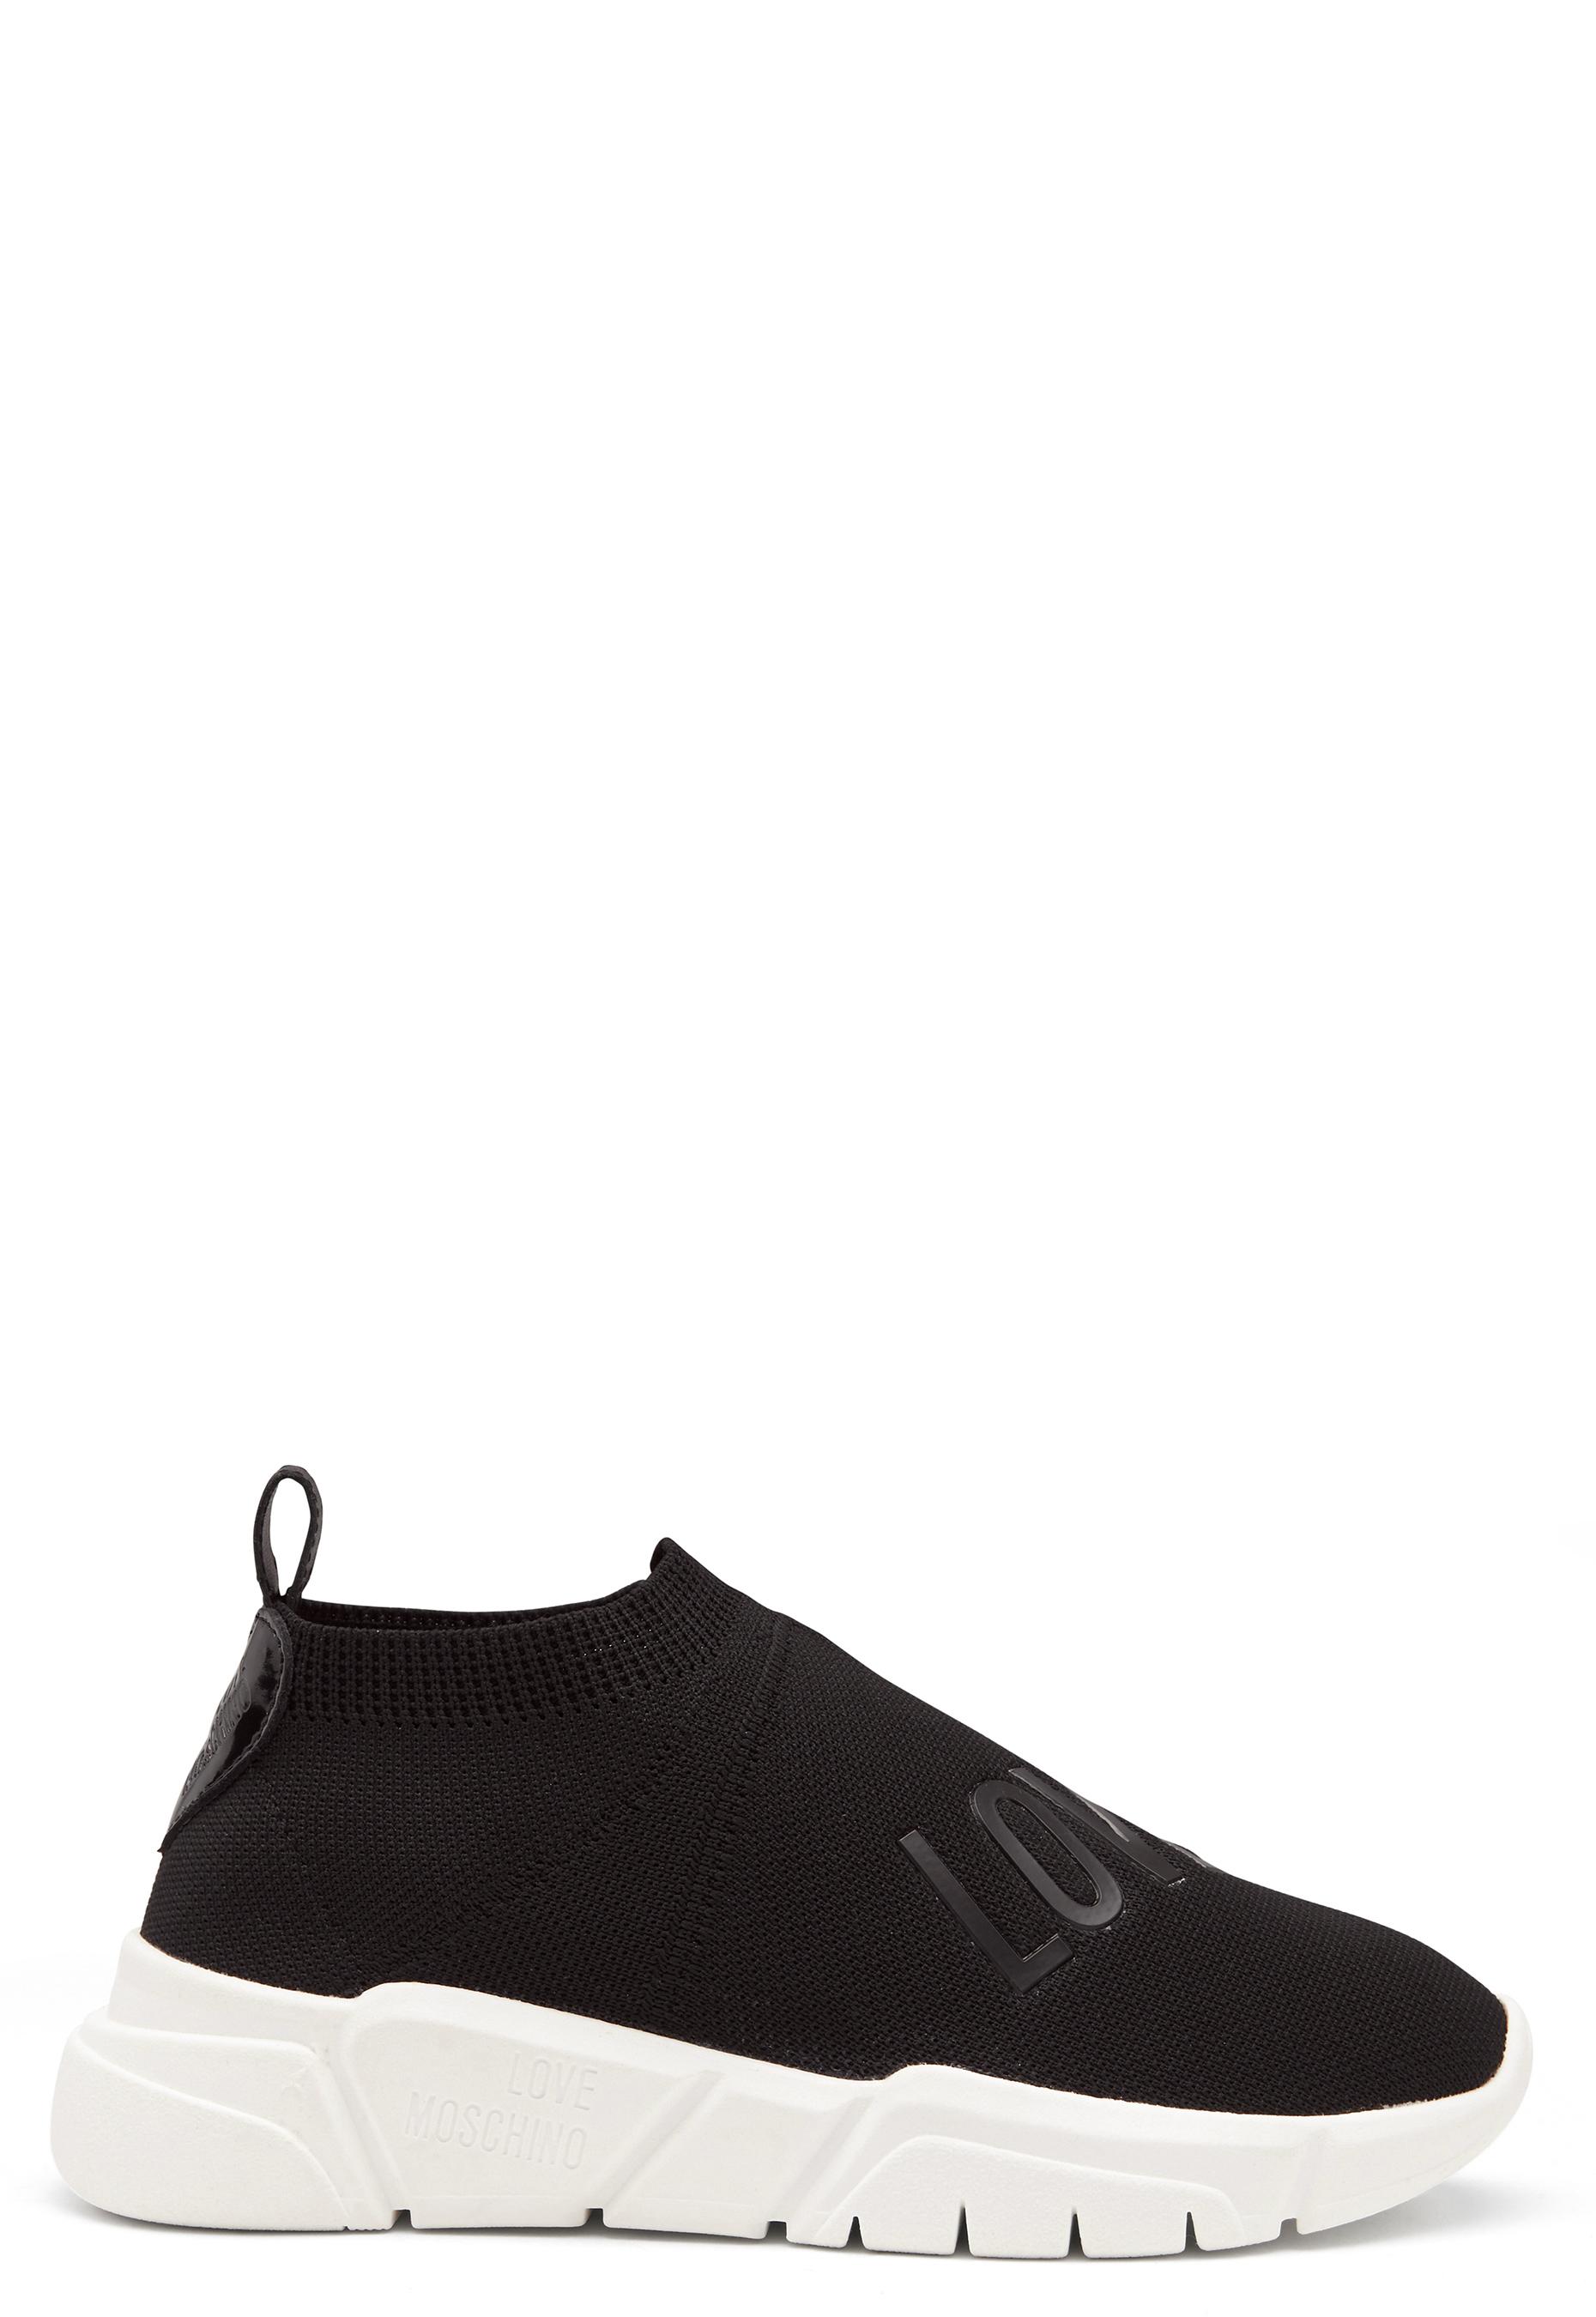 Love Moschino Moschino Shoe Black